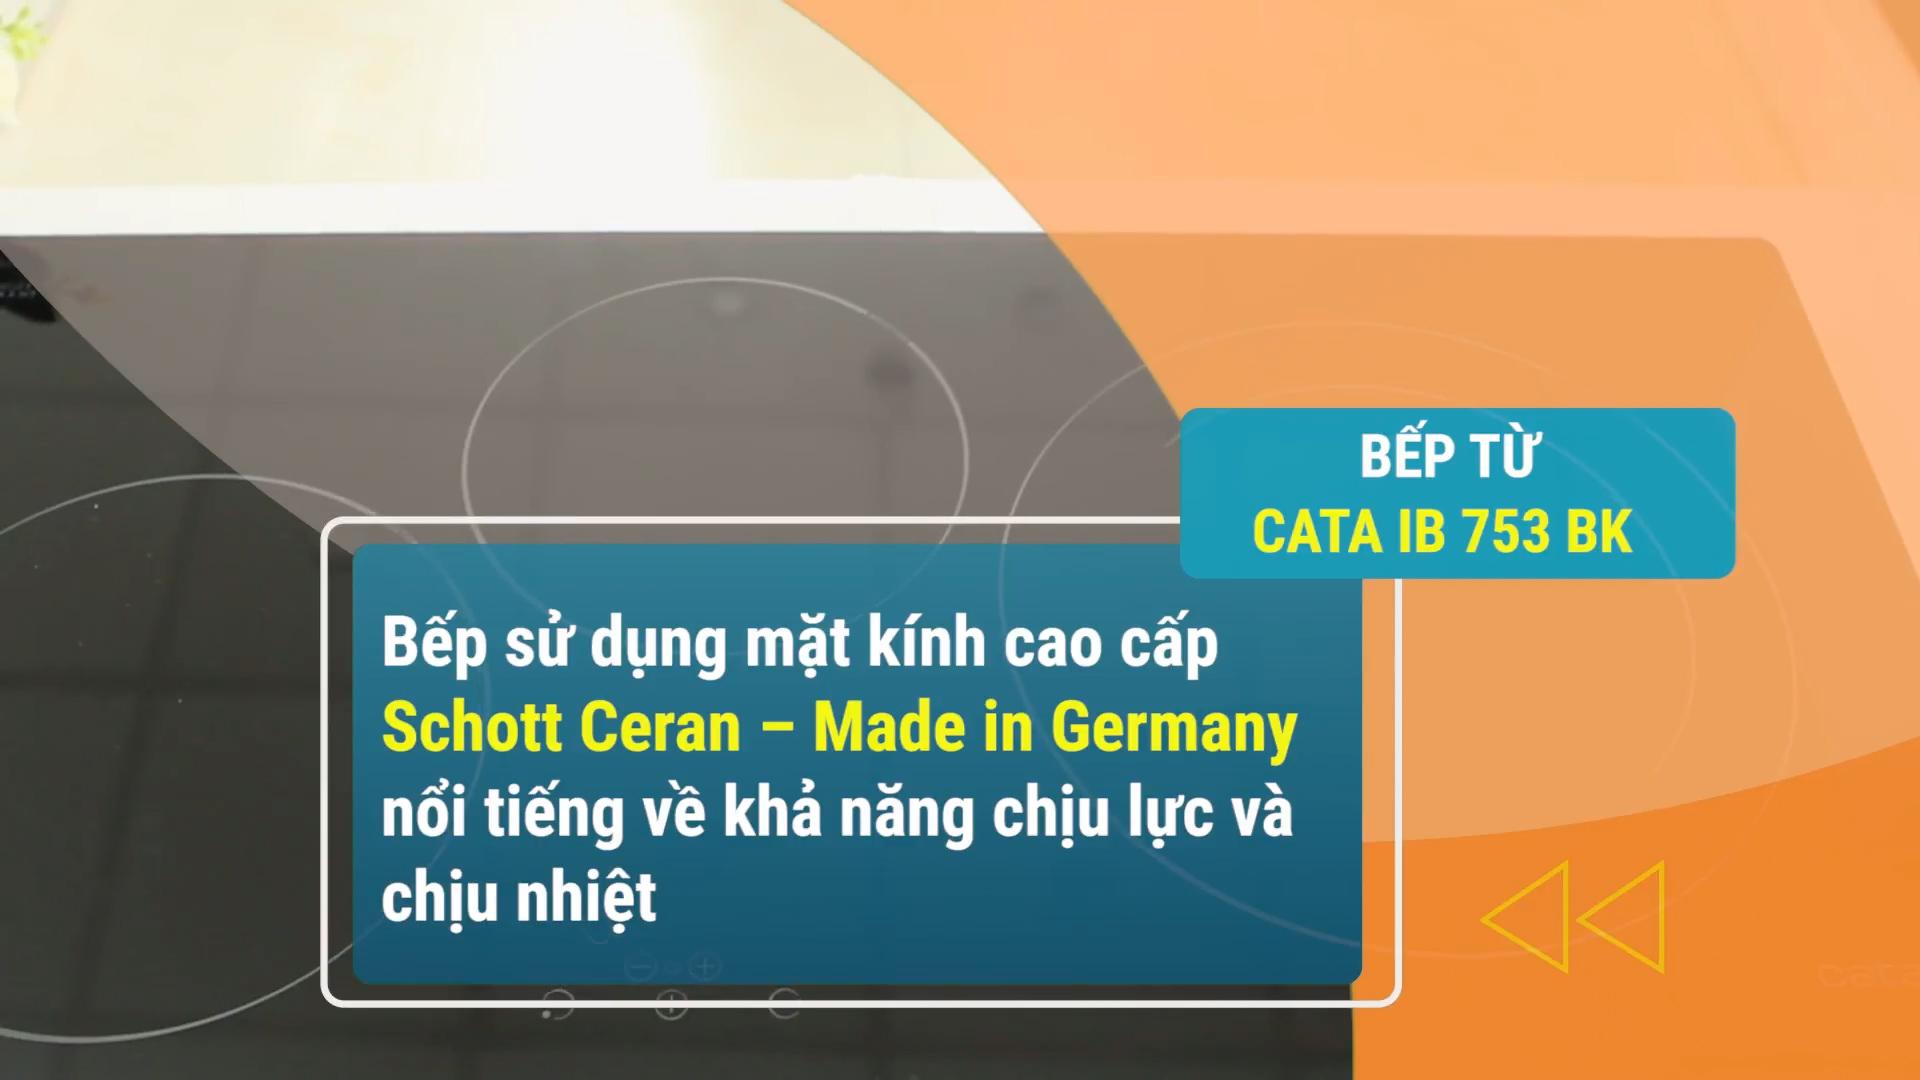 Mặt kính bếp từ Cata IB 753BK